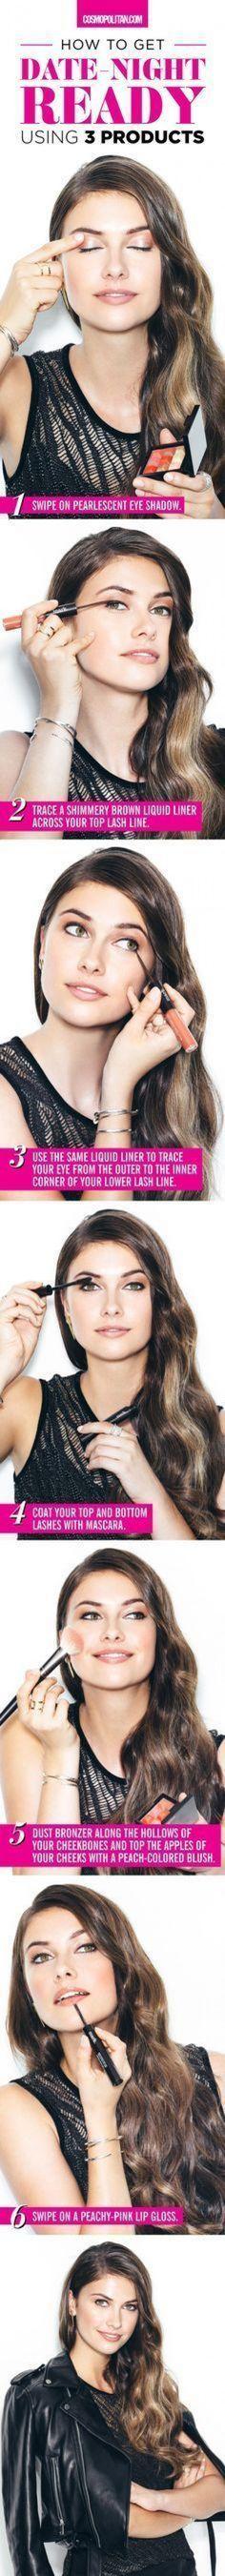 Buy Cheap Eye Shadow Professional New 9 Color Love Pearlescent Eyeshadow Dish Peach Earth Color Makeup Tray Eyeshadow Dec12 High Safety Eye Shadow